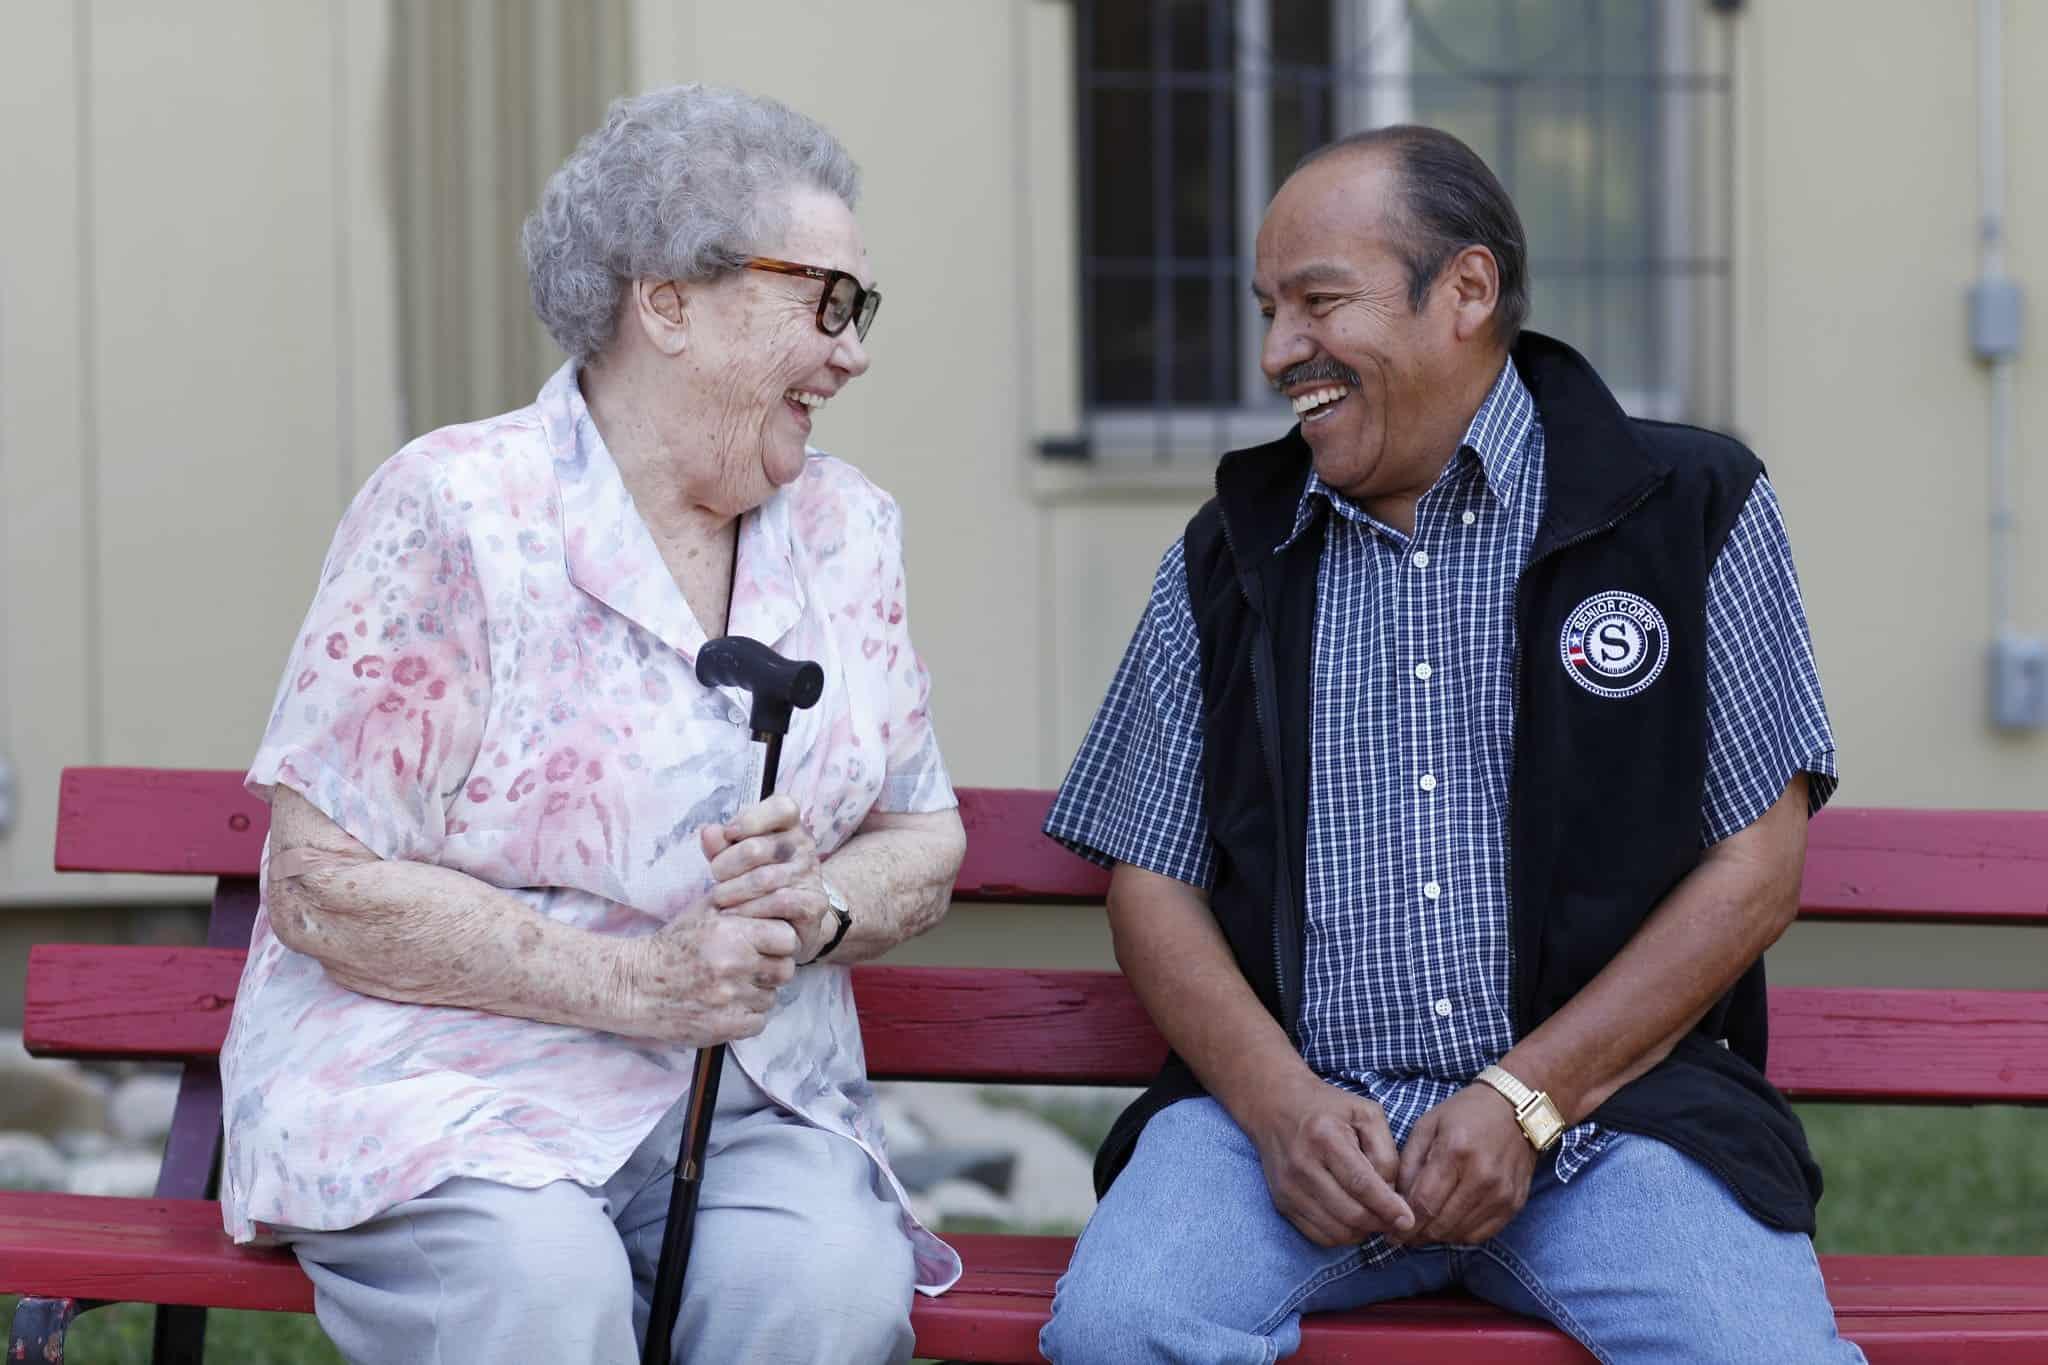 AmeriCorps Seniors Senior Companions volunteer